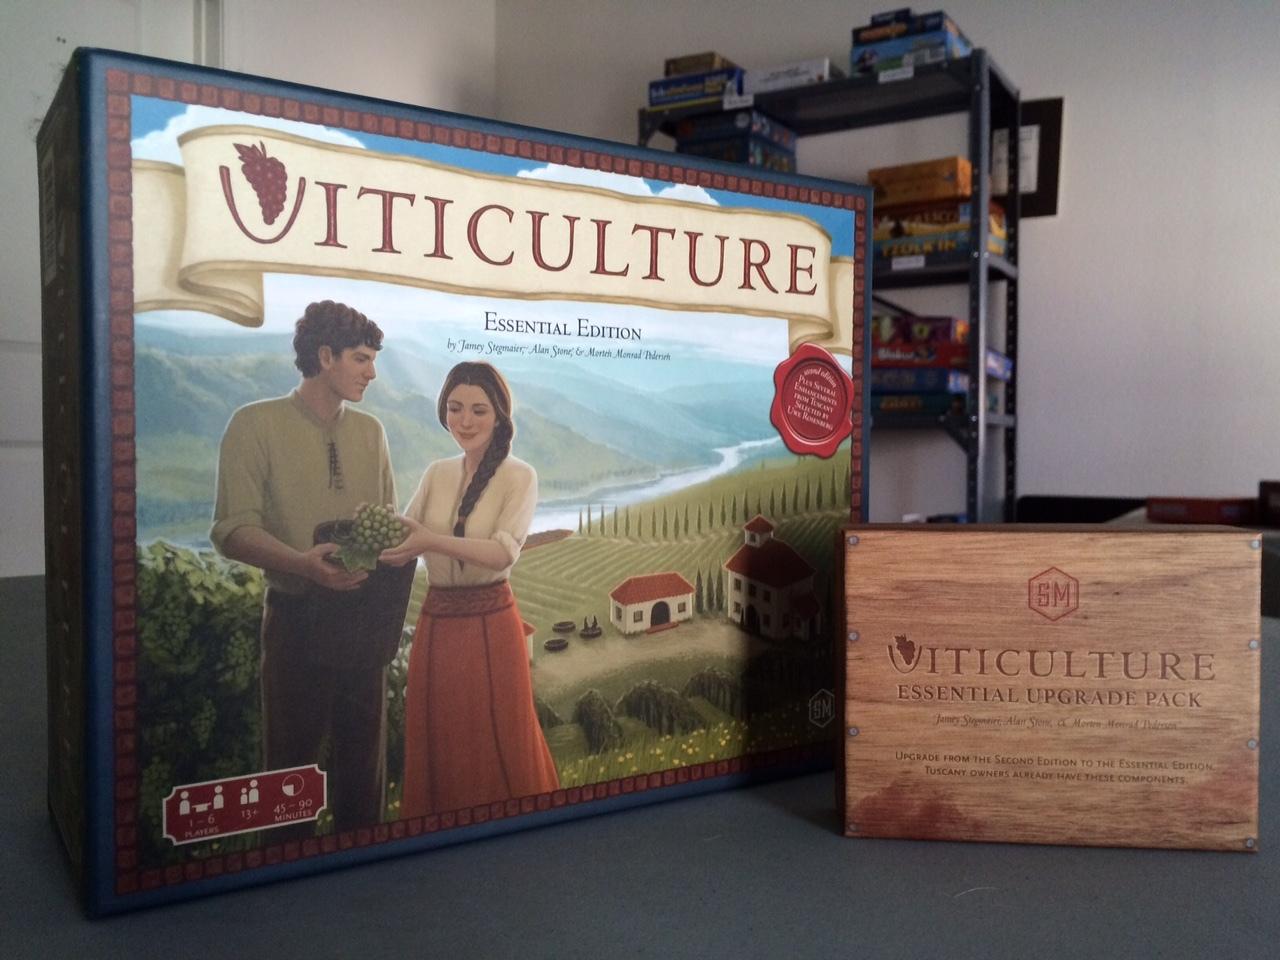 Viticulture - Essential Edition image